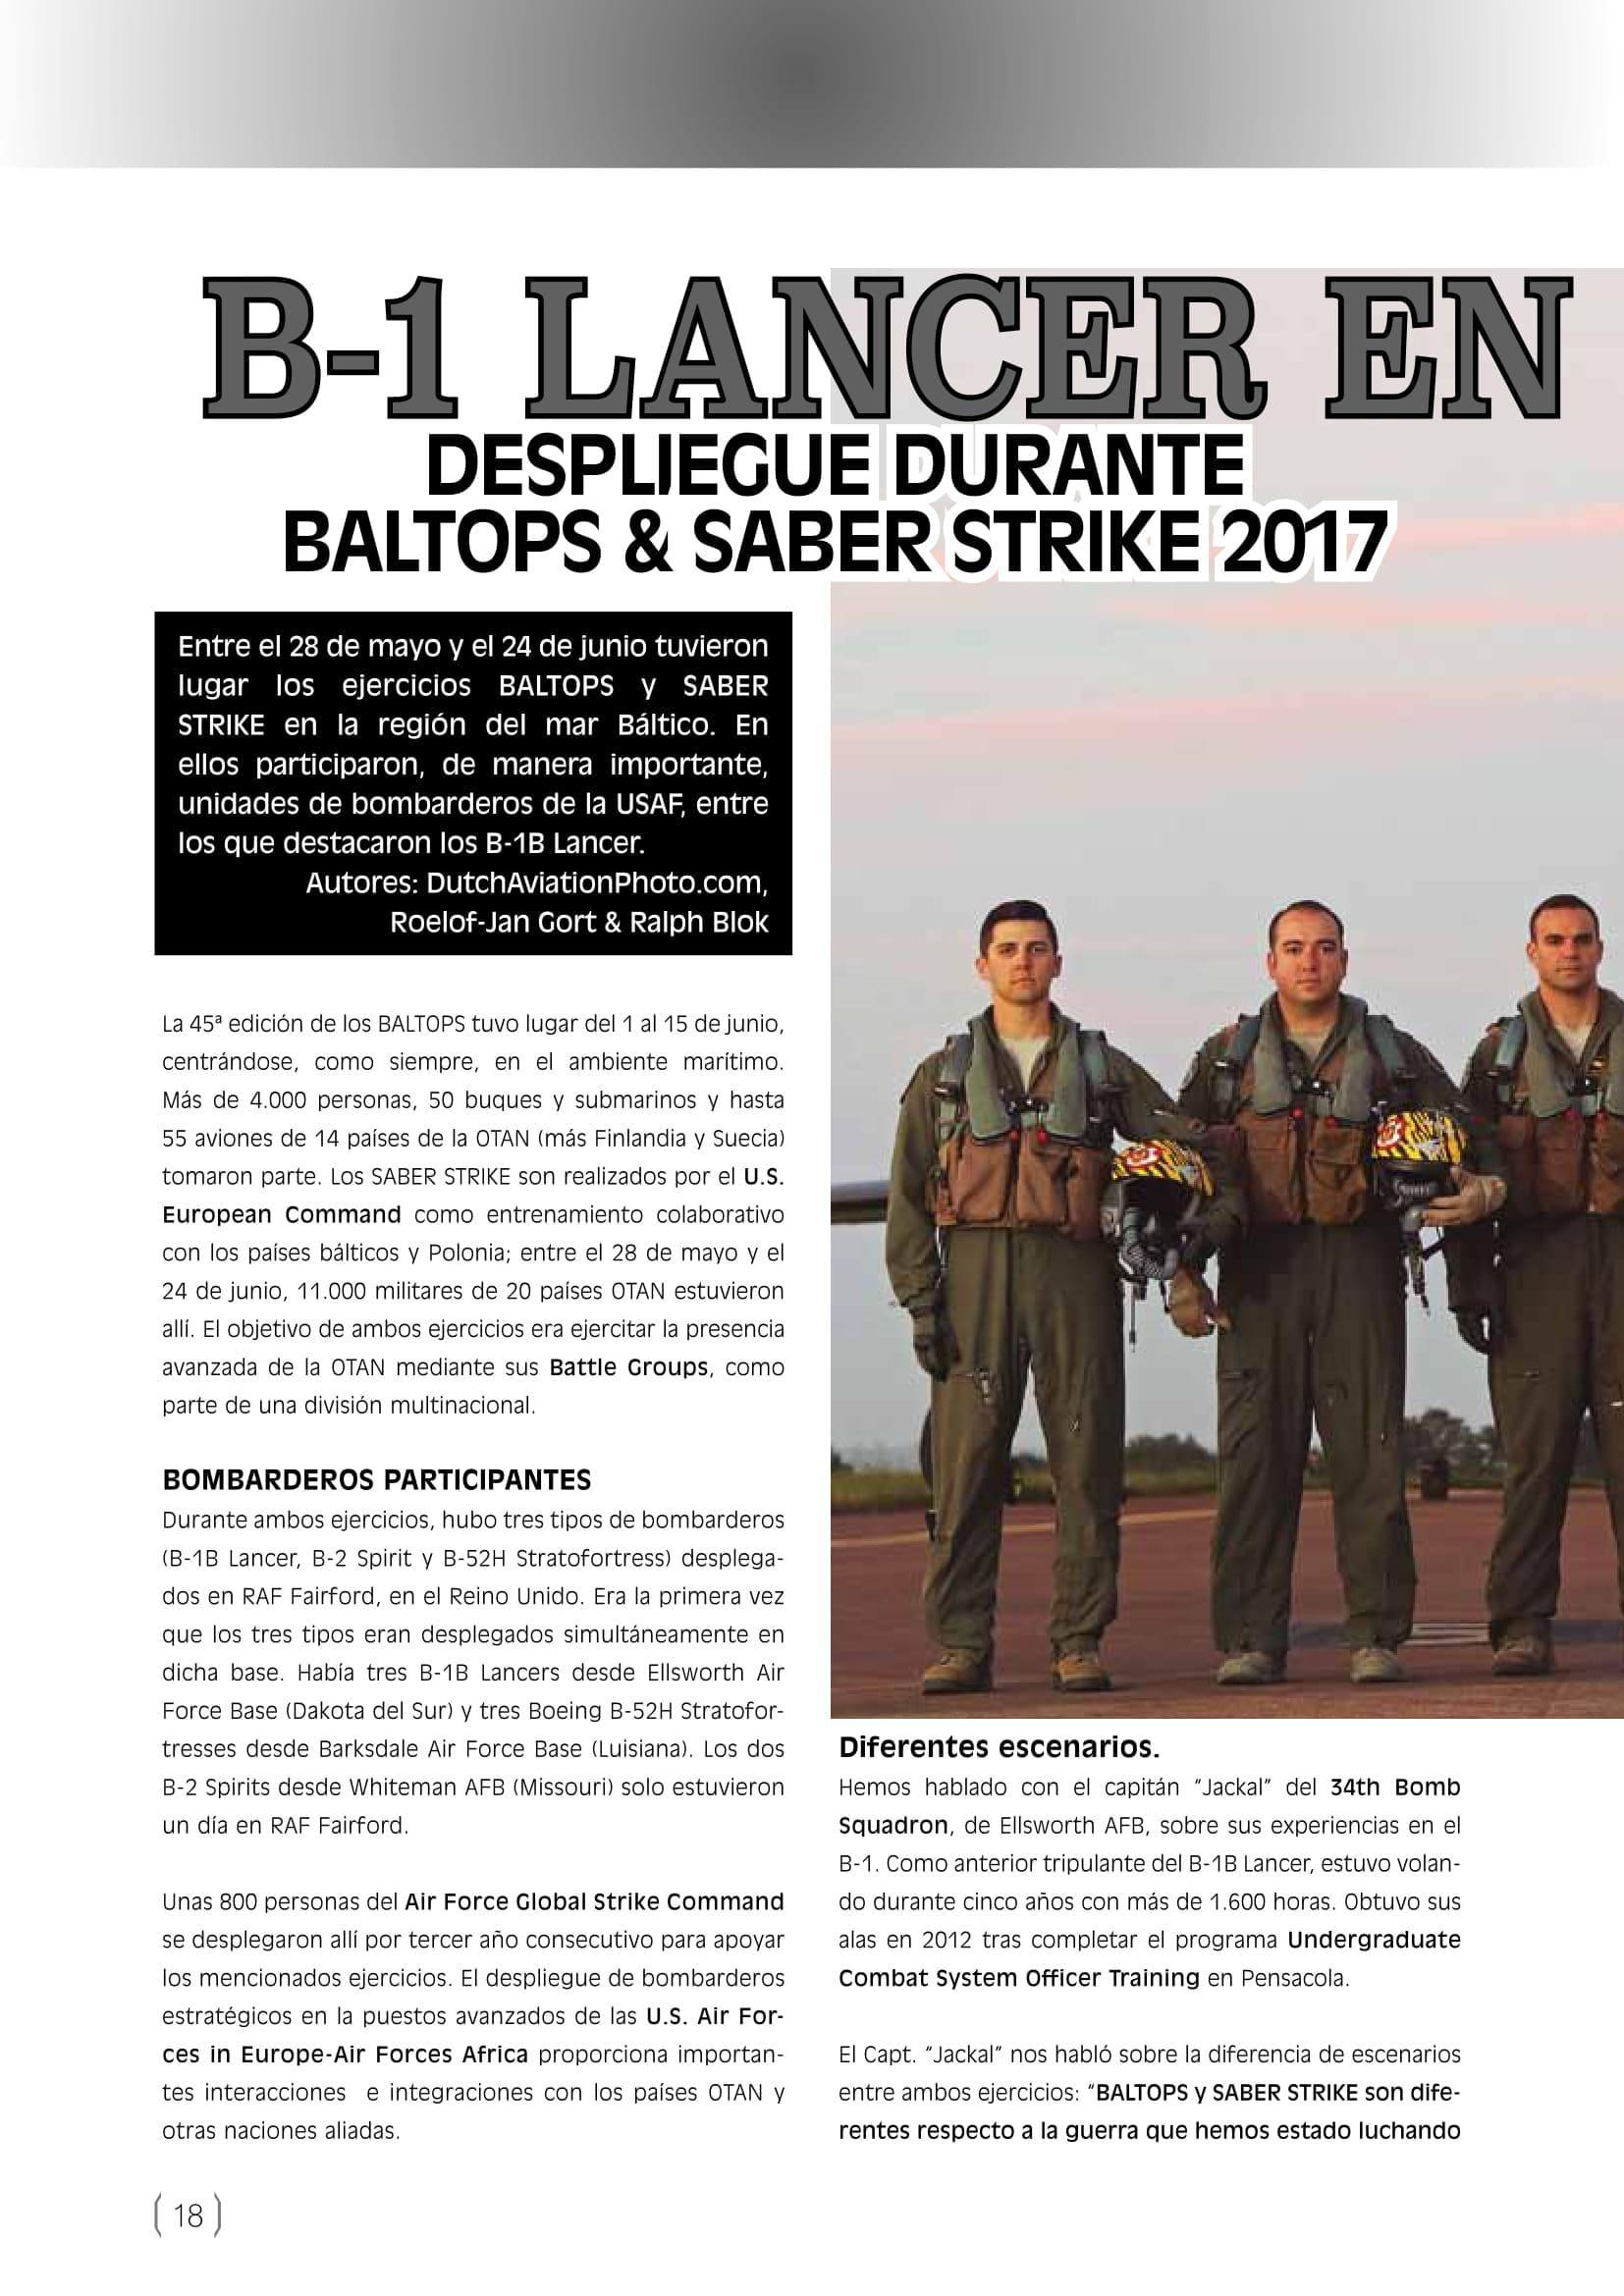 FAM (Spain)_Baltops & Saber Strike 2017-2